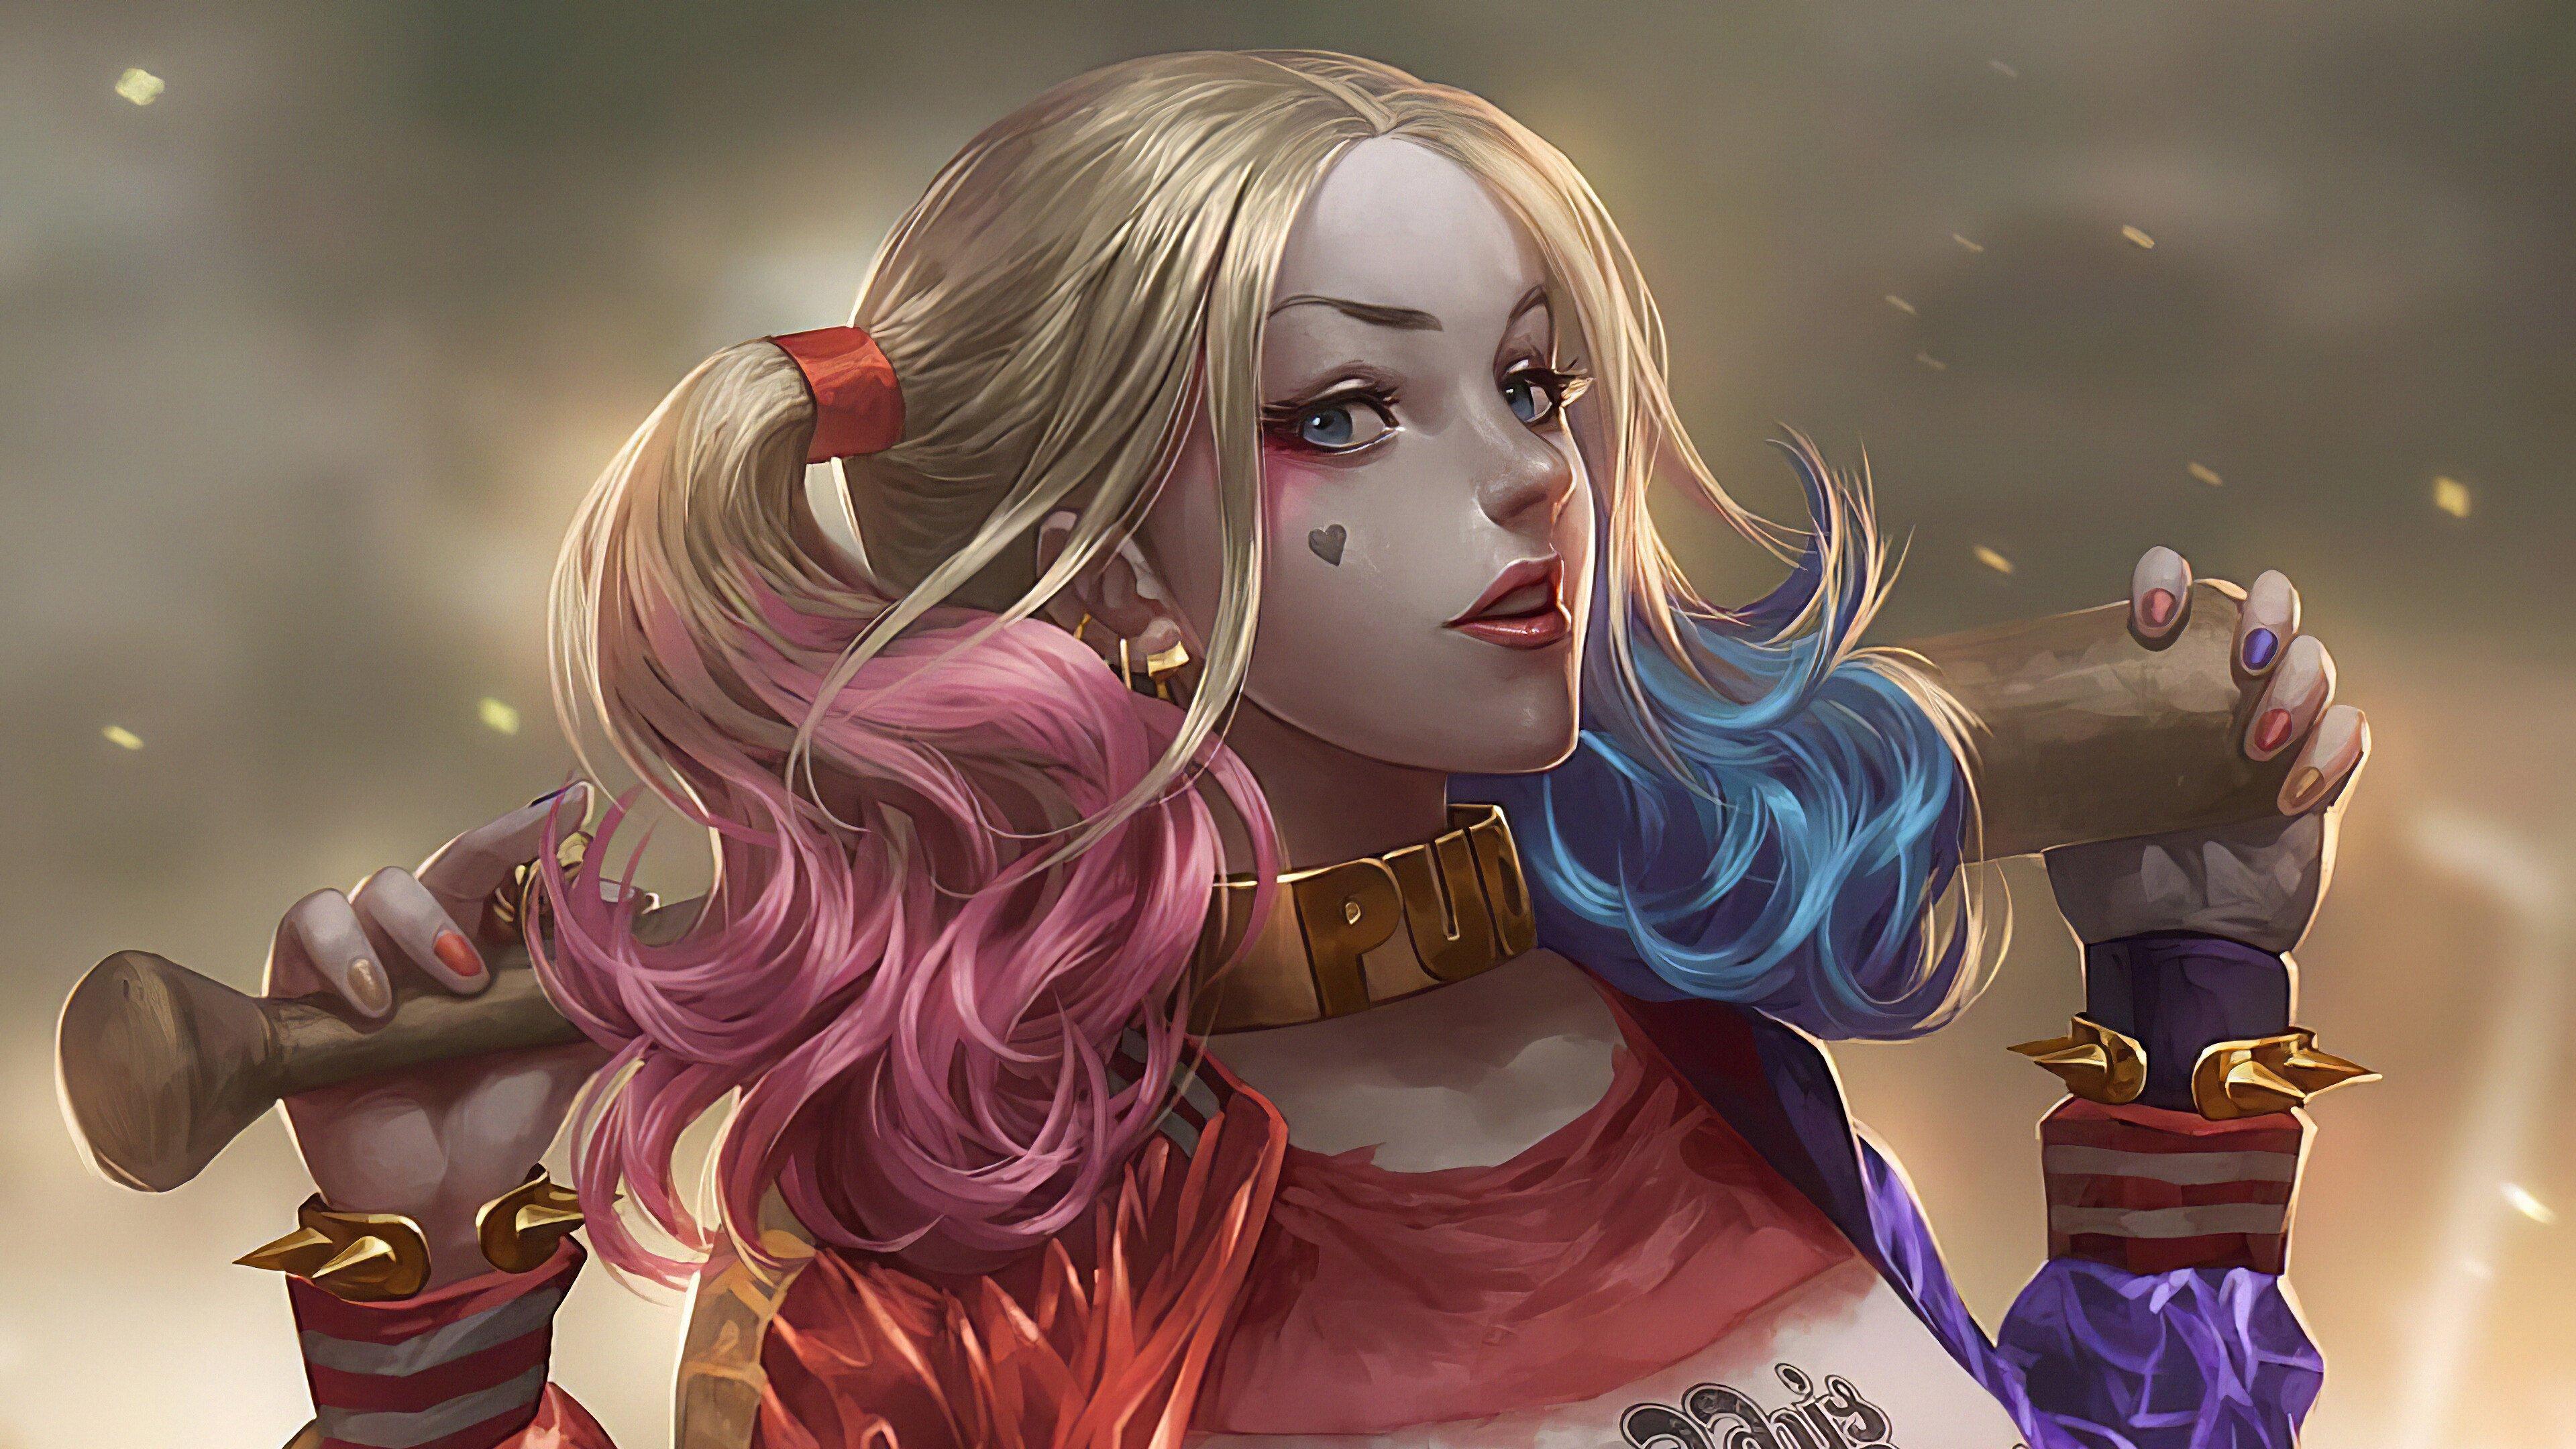 Wallpaper Harley Quinn with bat Fanart